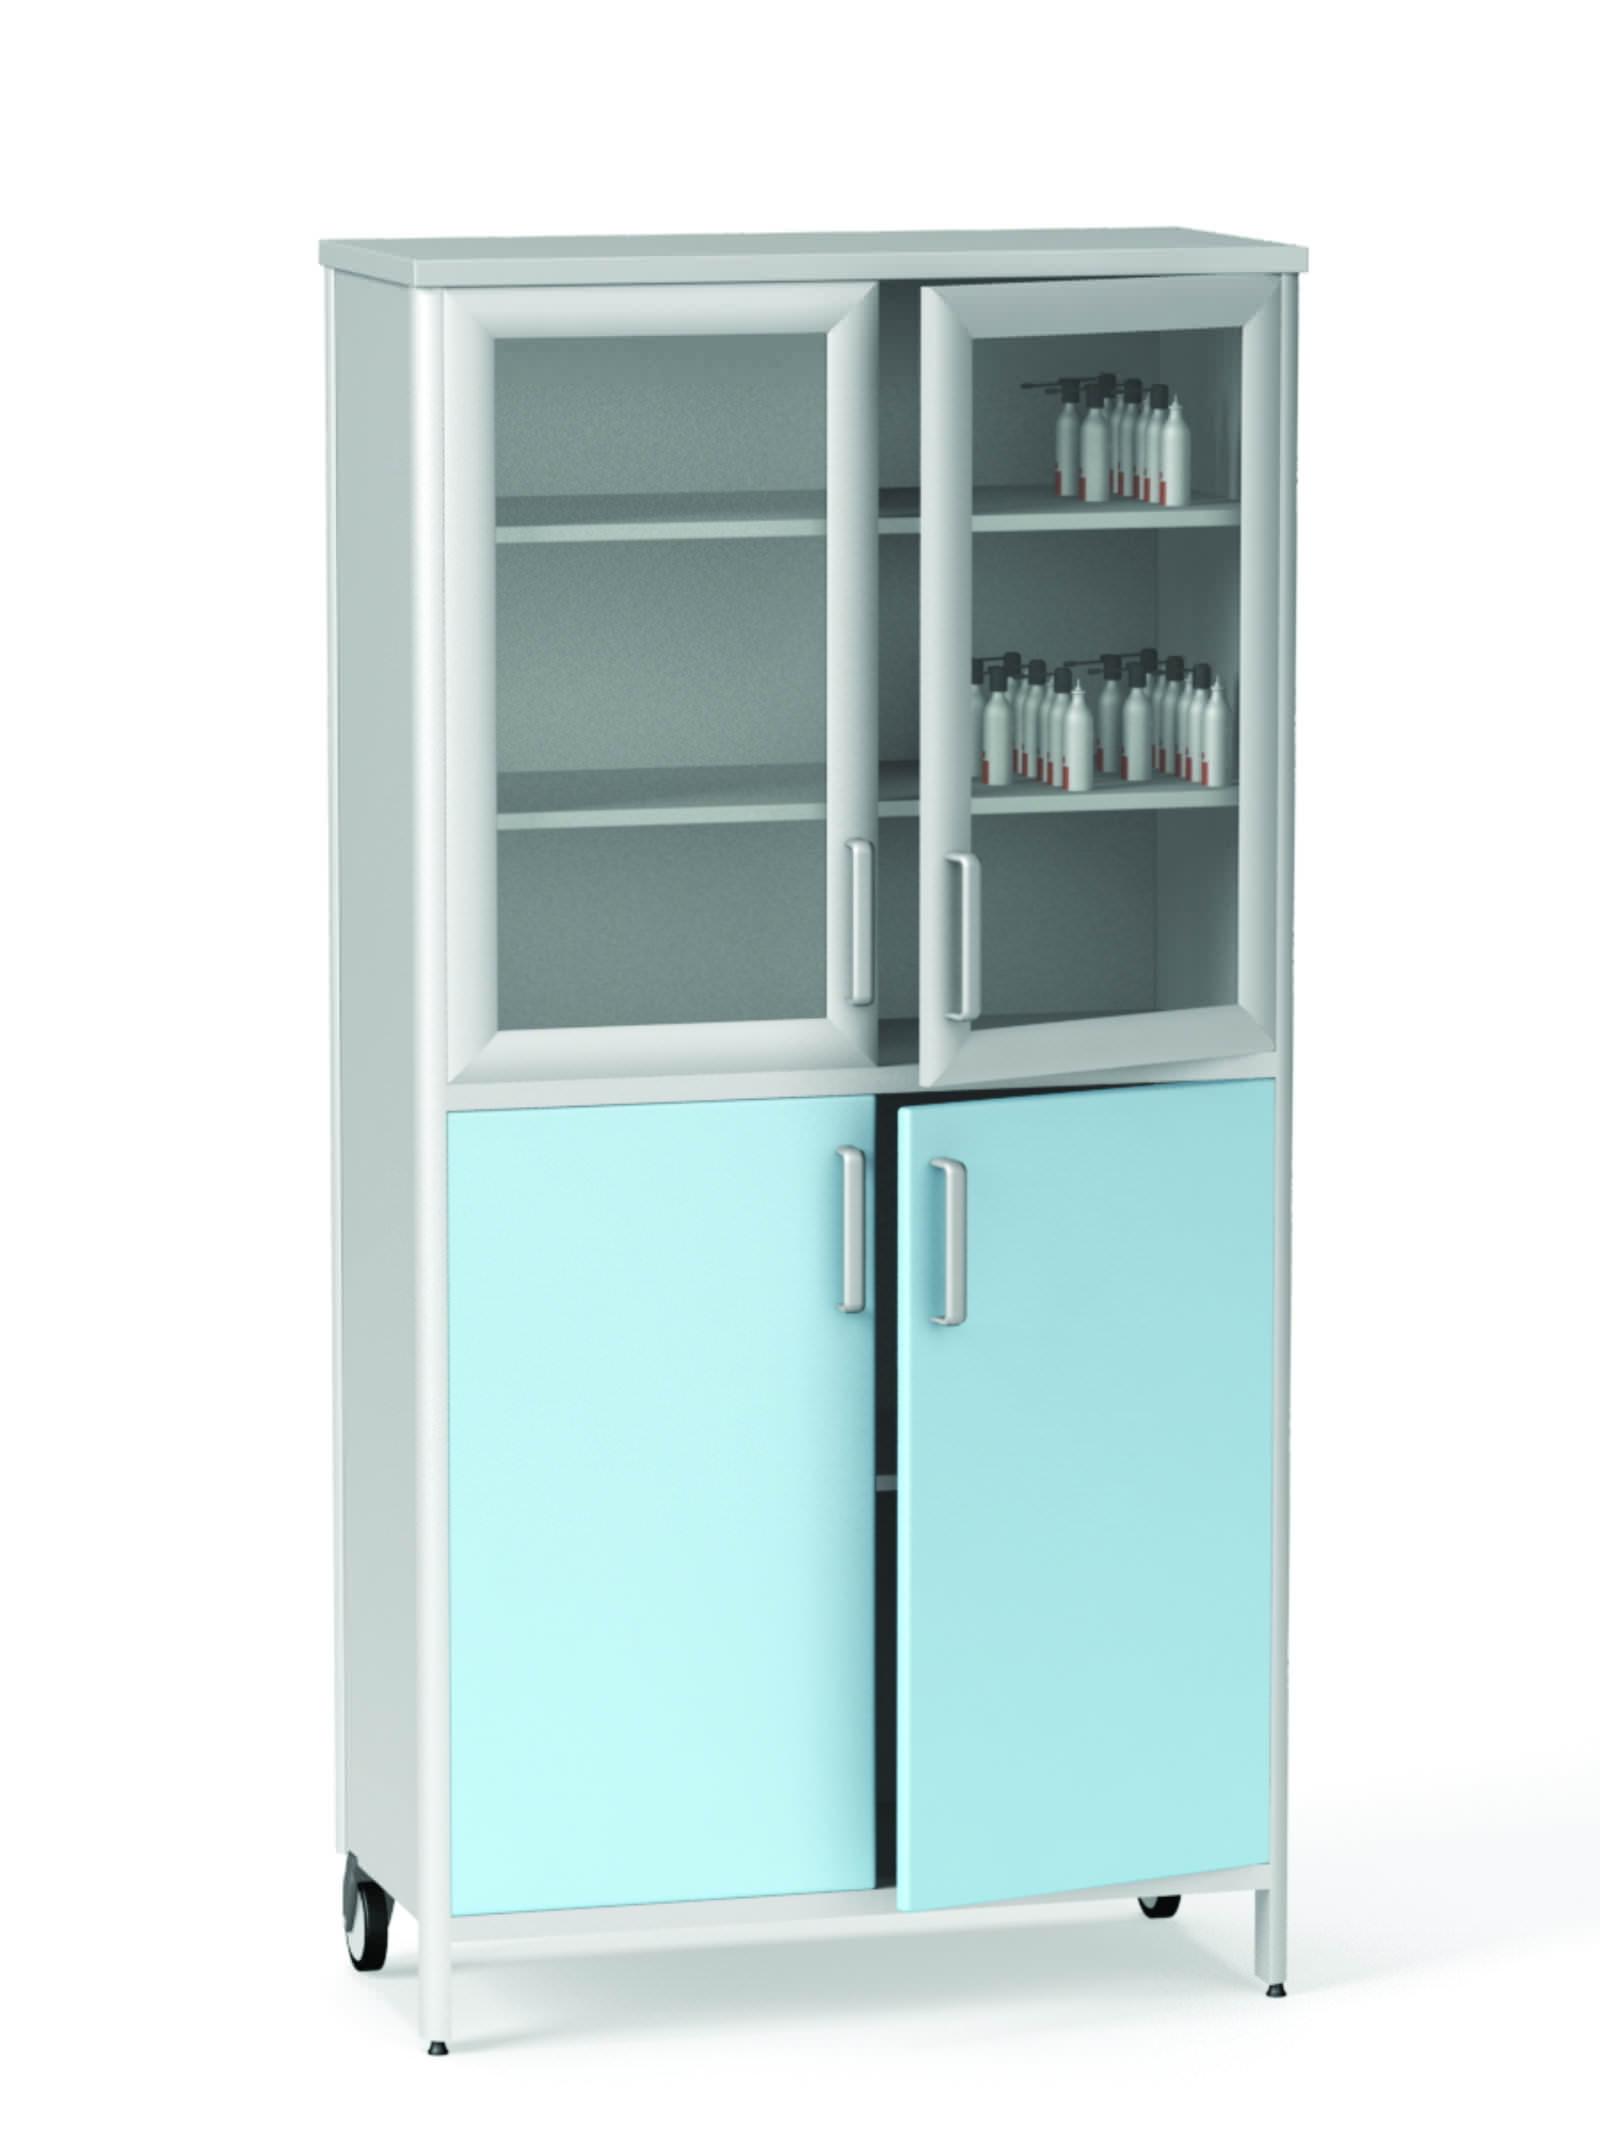 Медицинский шкаф ДМ-3-001-13, фото 2